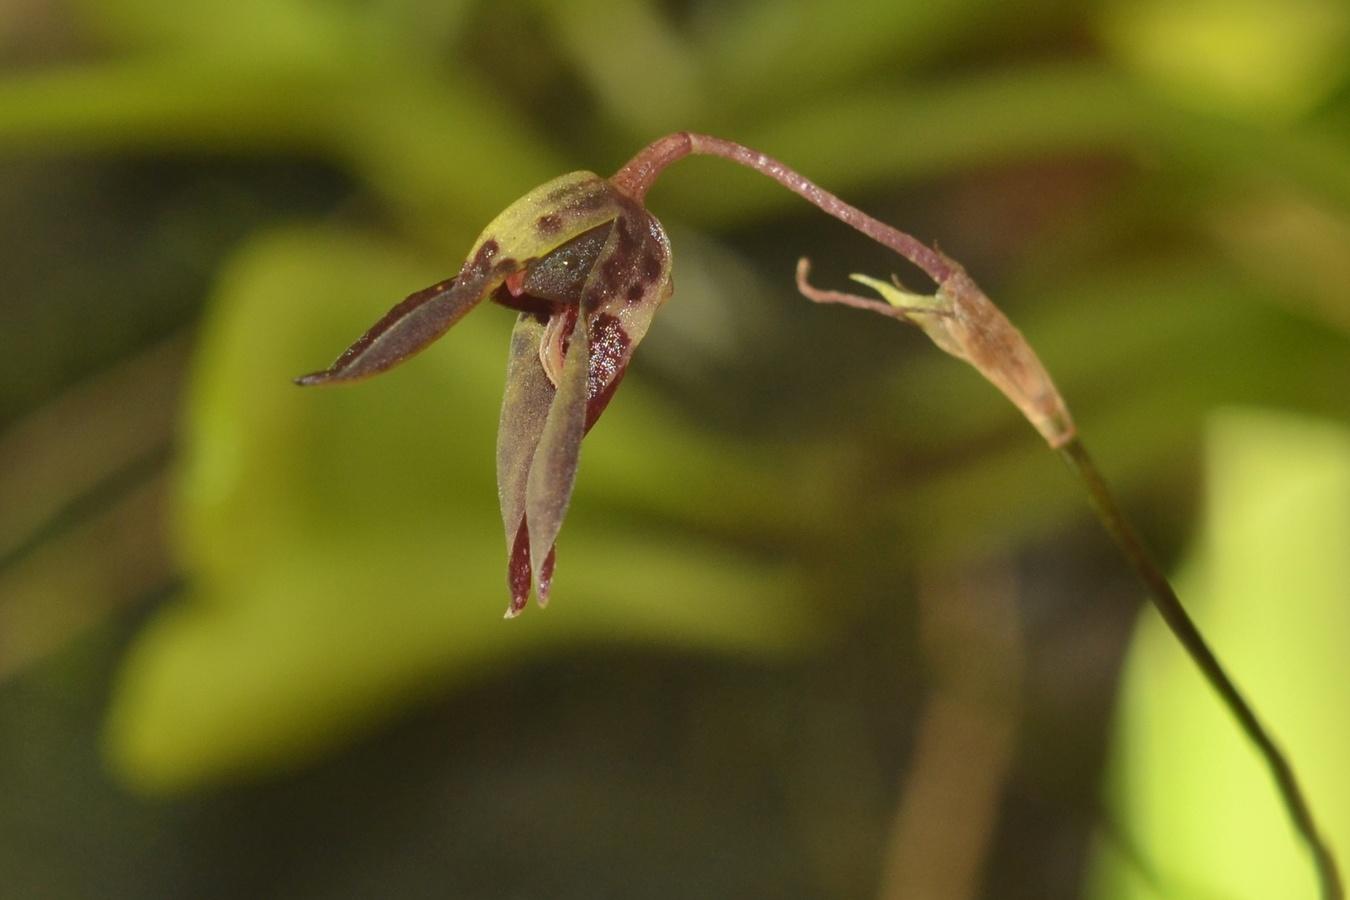 Specklinia acrisepala